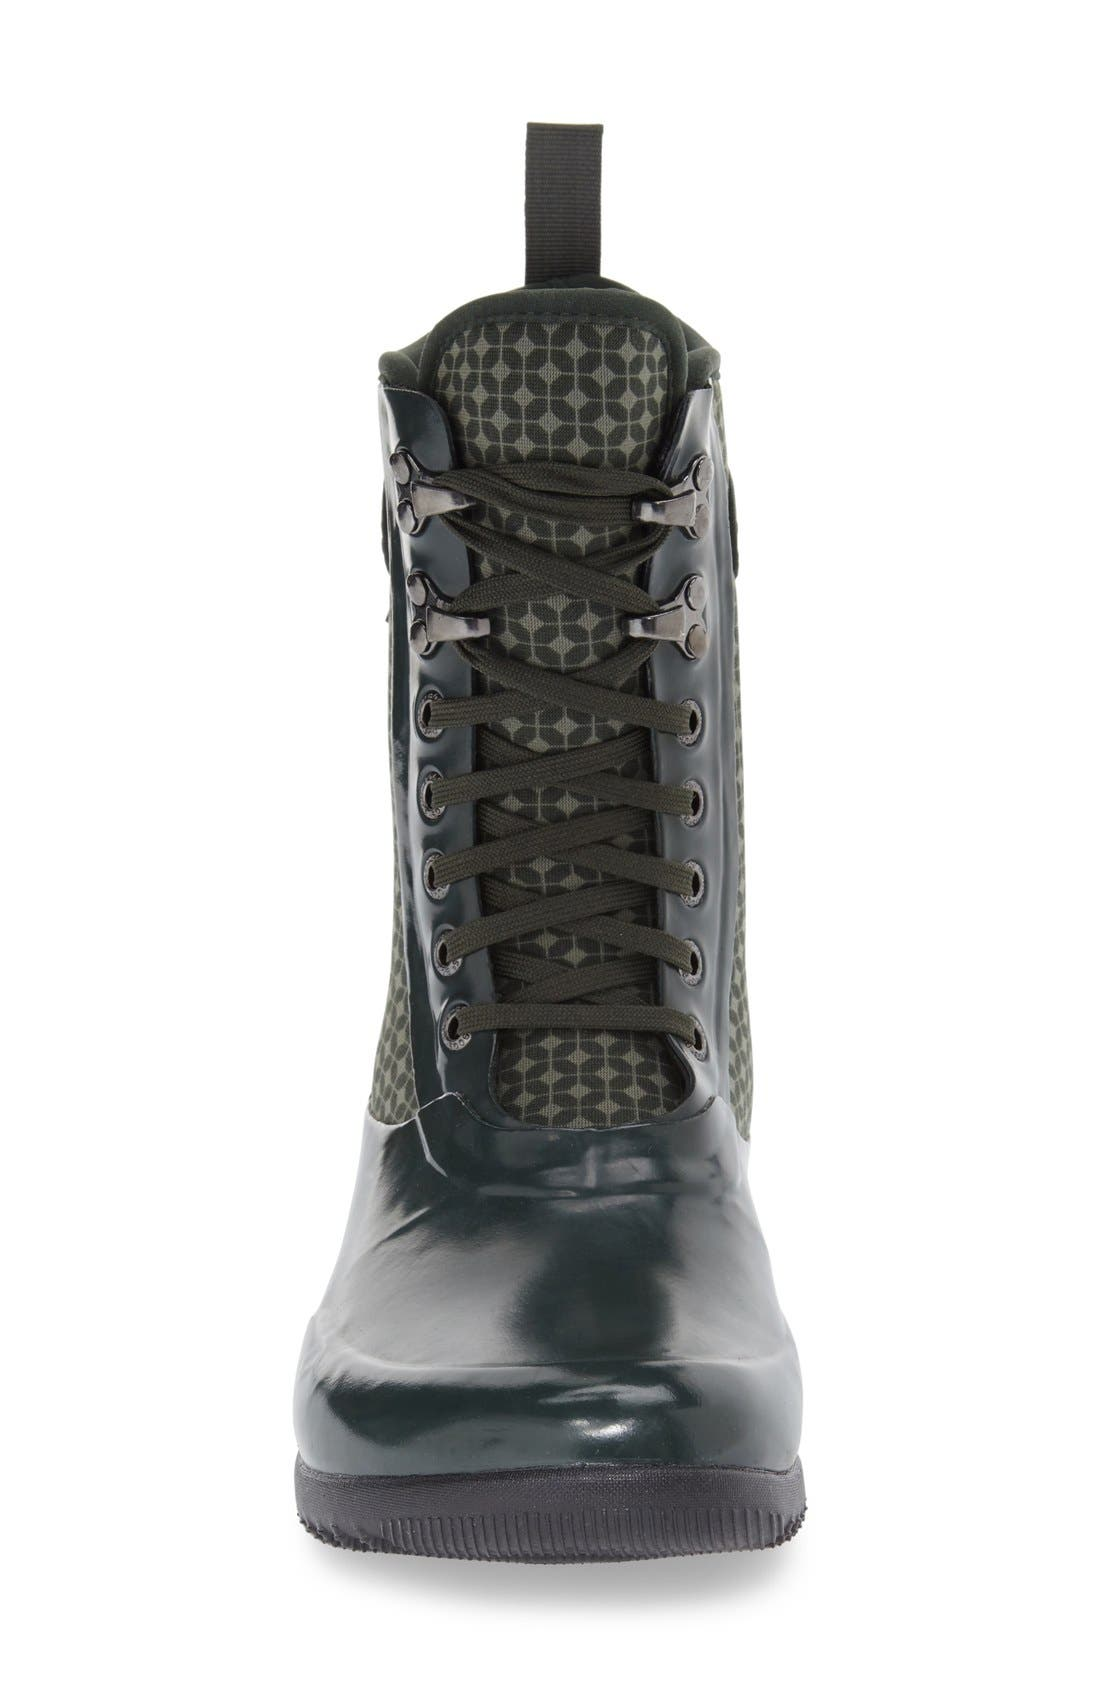 Alternate Image 3  - Bogs 'Sidney Cravat' Lace-Up Waterproof Boot (Women)